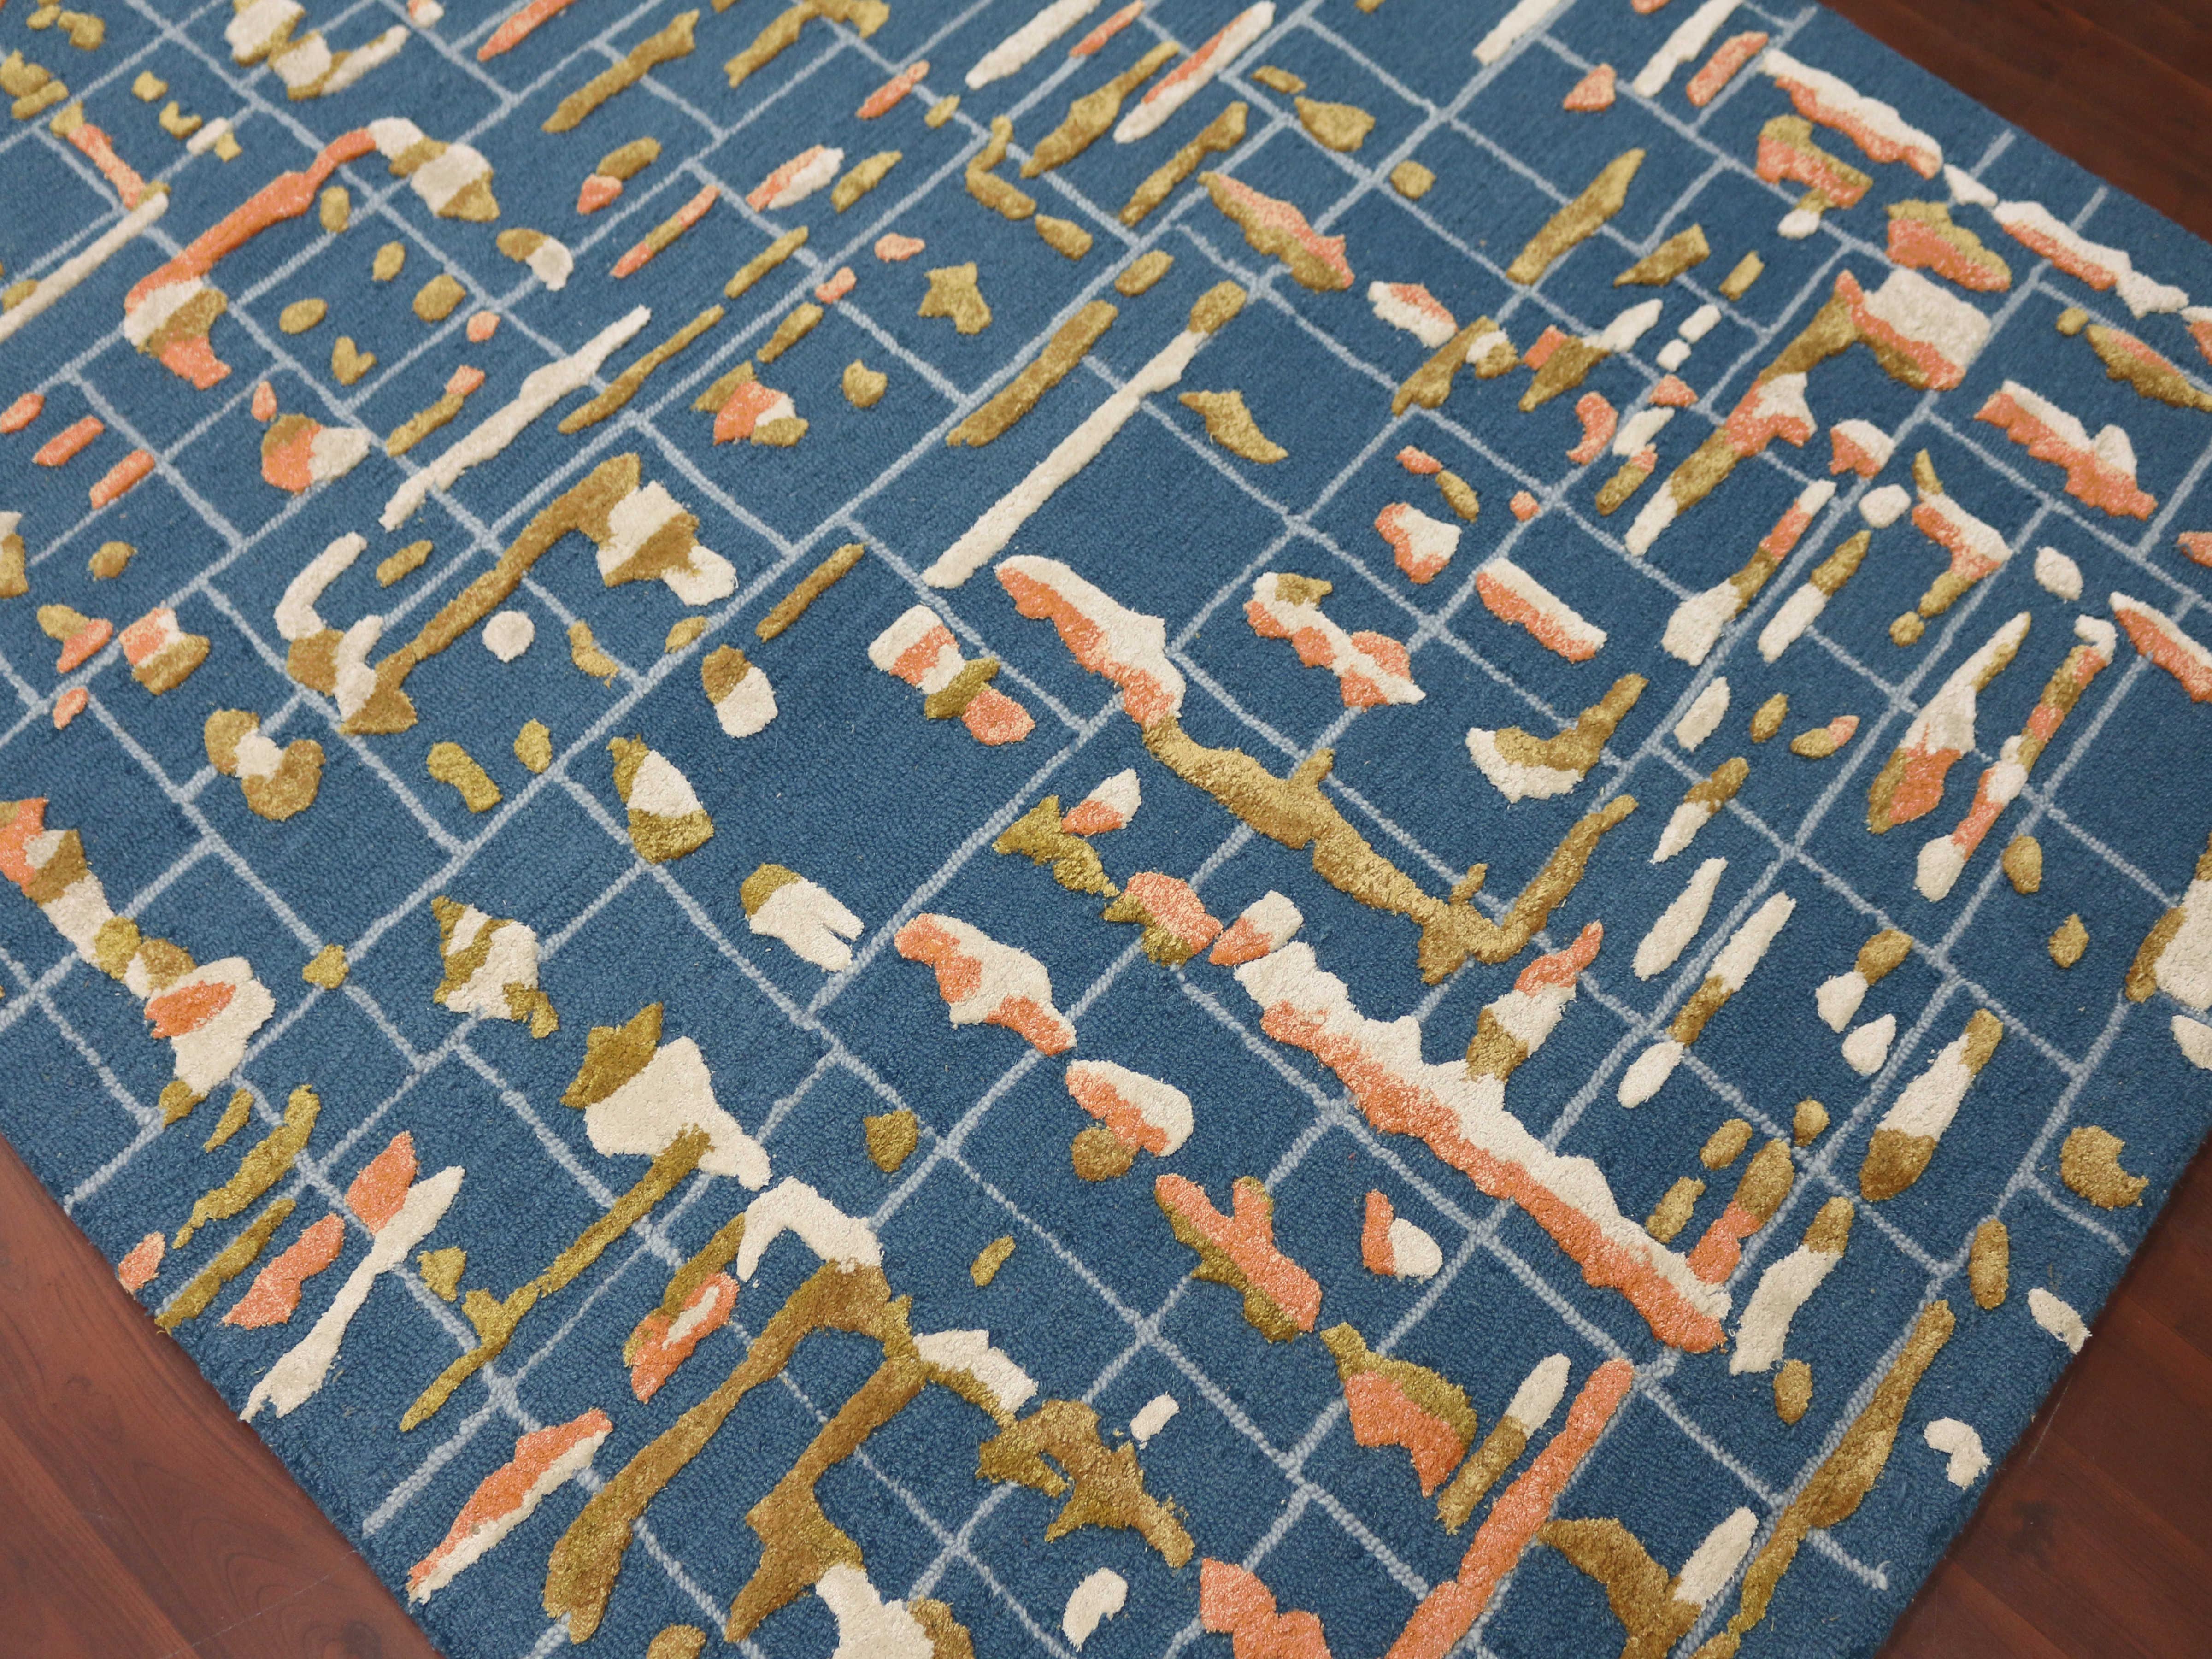 Amer Rugs Perla Blue Yellow Orange Ivory Rectangular